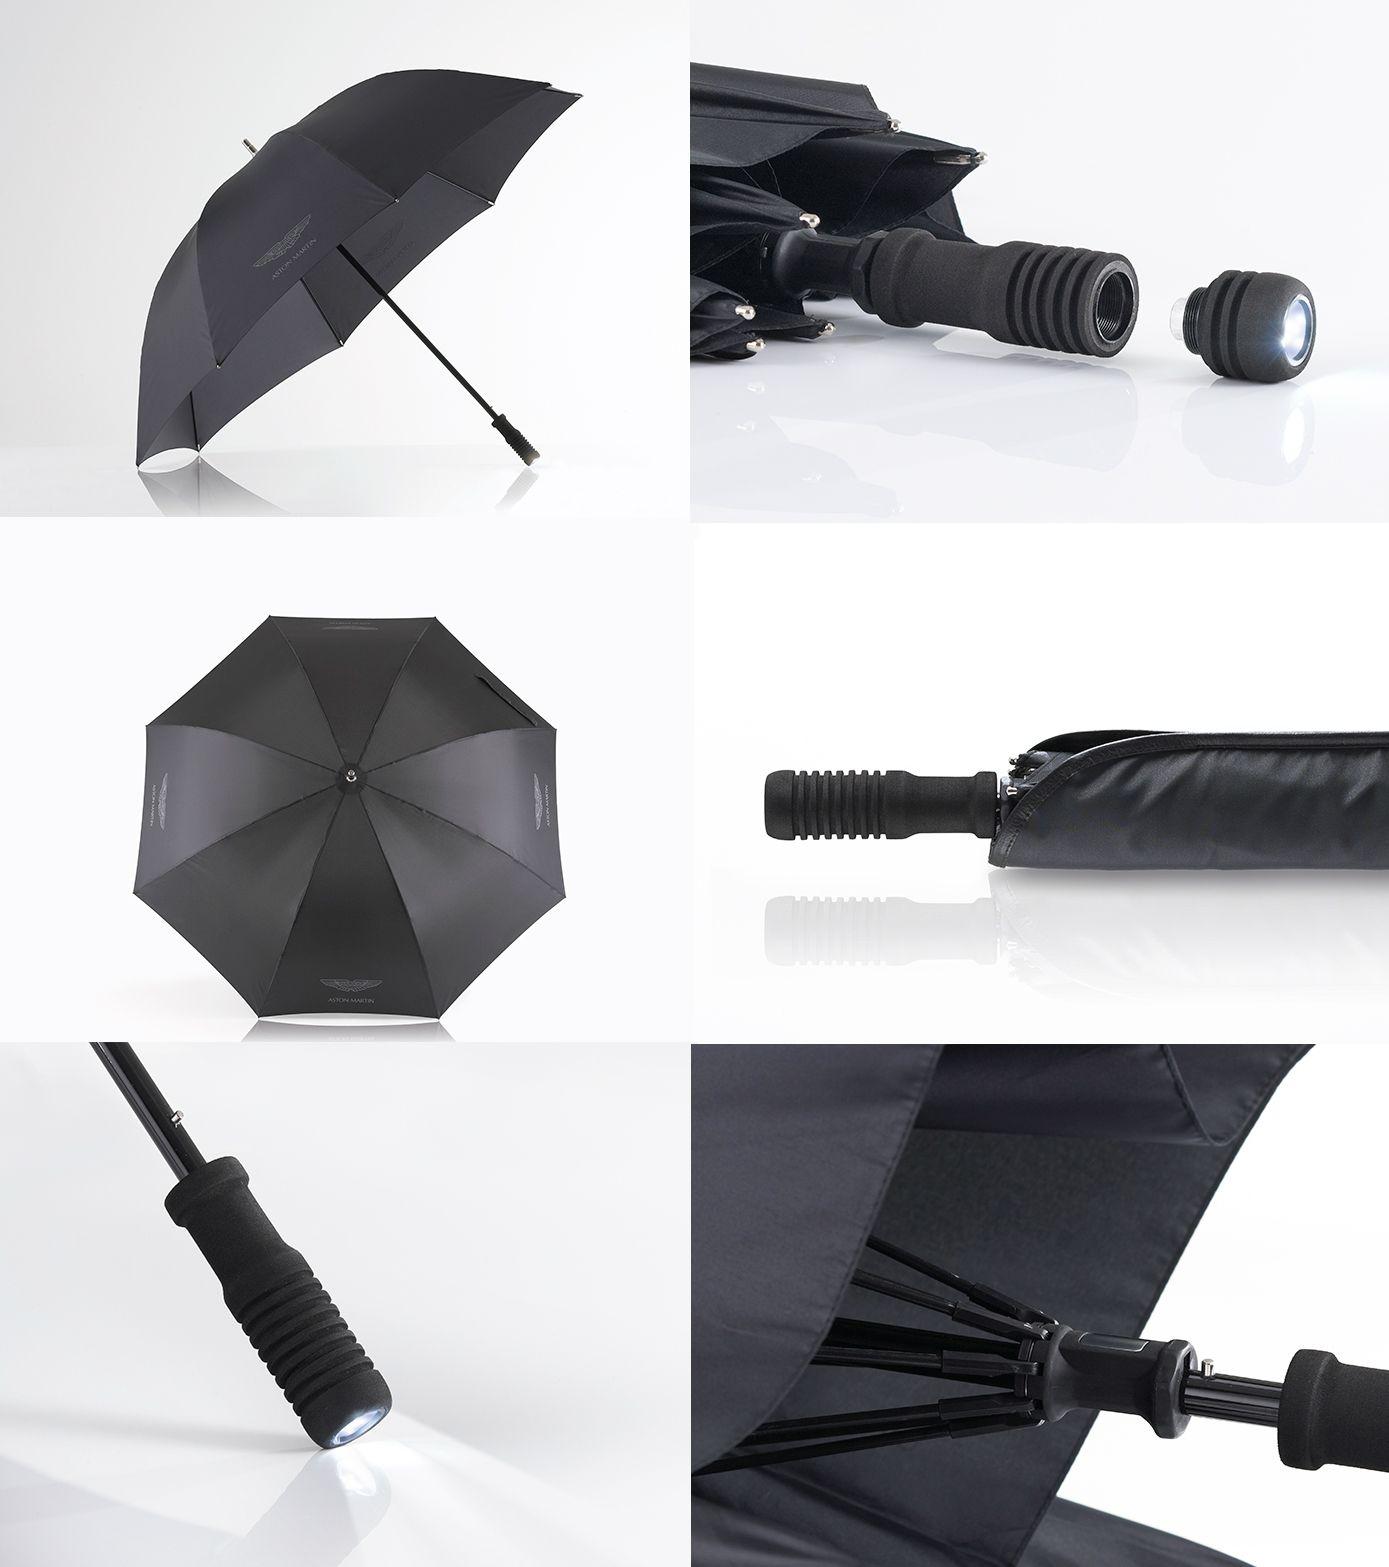 The Aston Martin Umbrella Collection Aston Martin Advanced Bike Umbrella